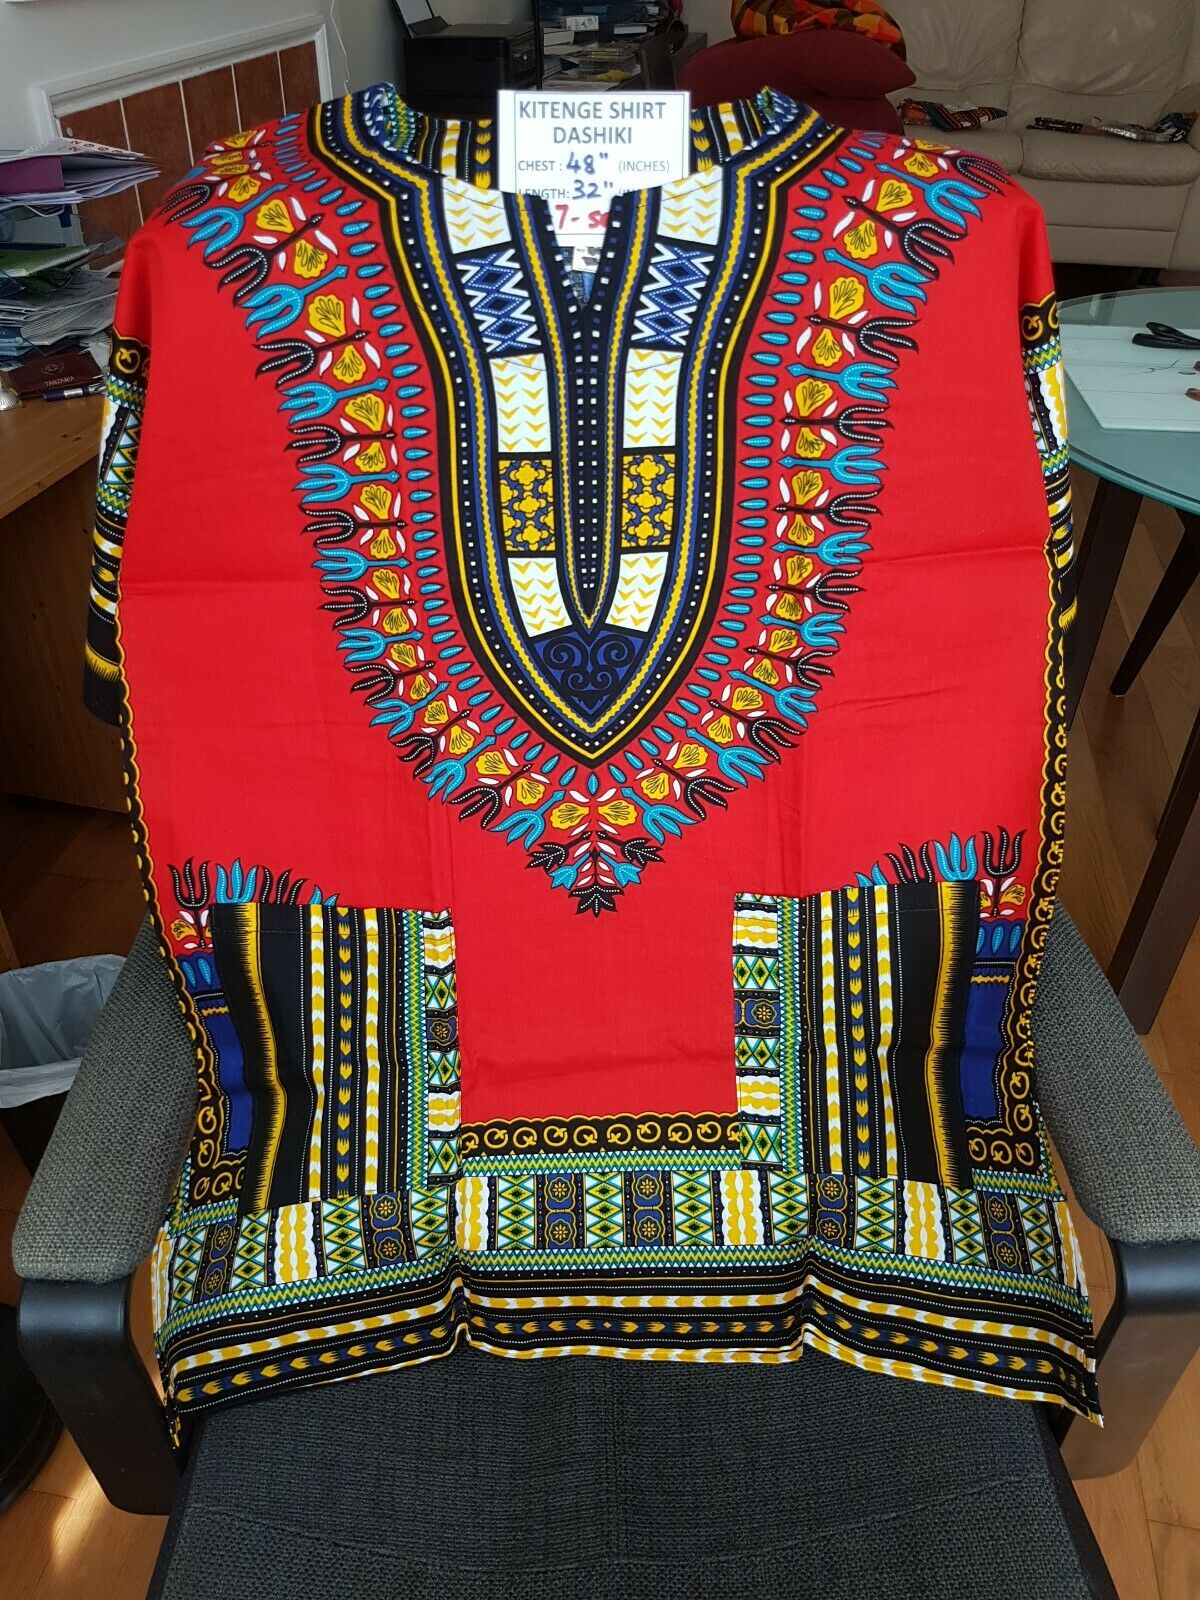 Dashiki African Tribal Print Blouse or Kitenge Top Shirt Red Size L No.7 UNISEX